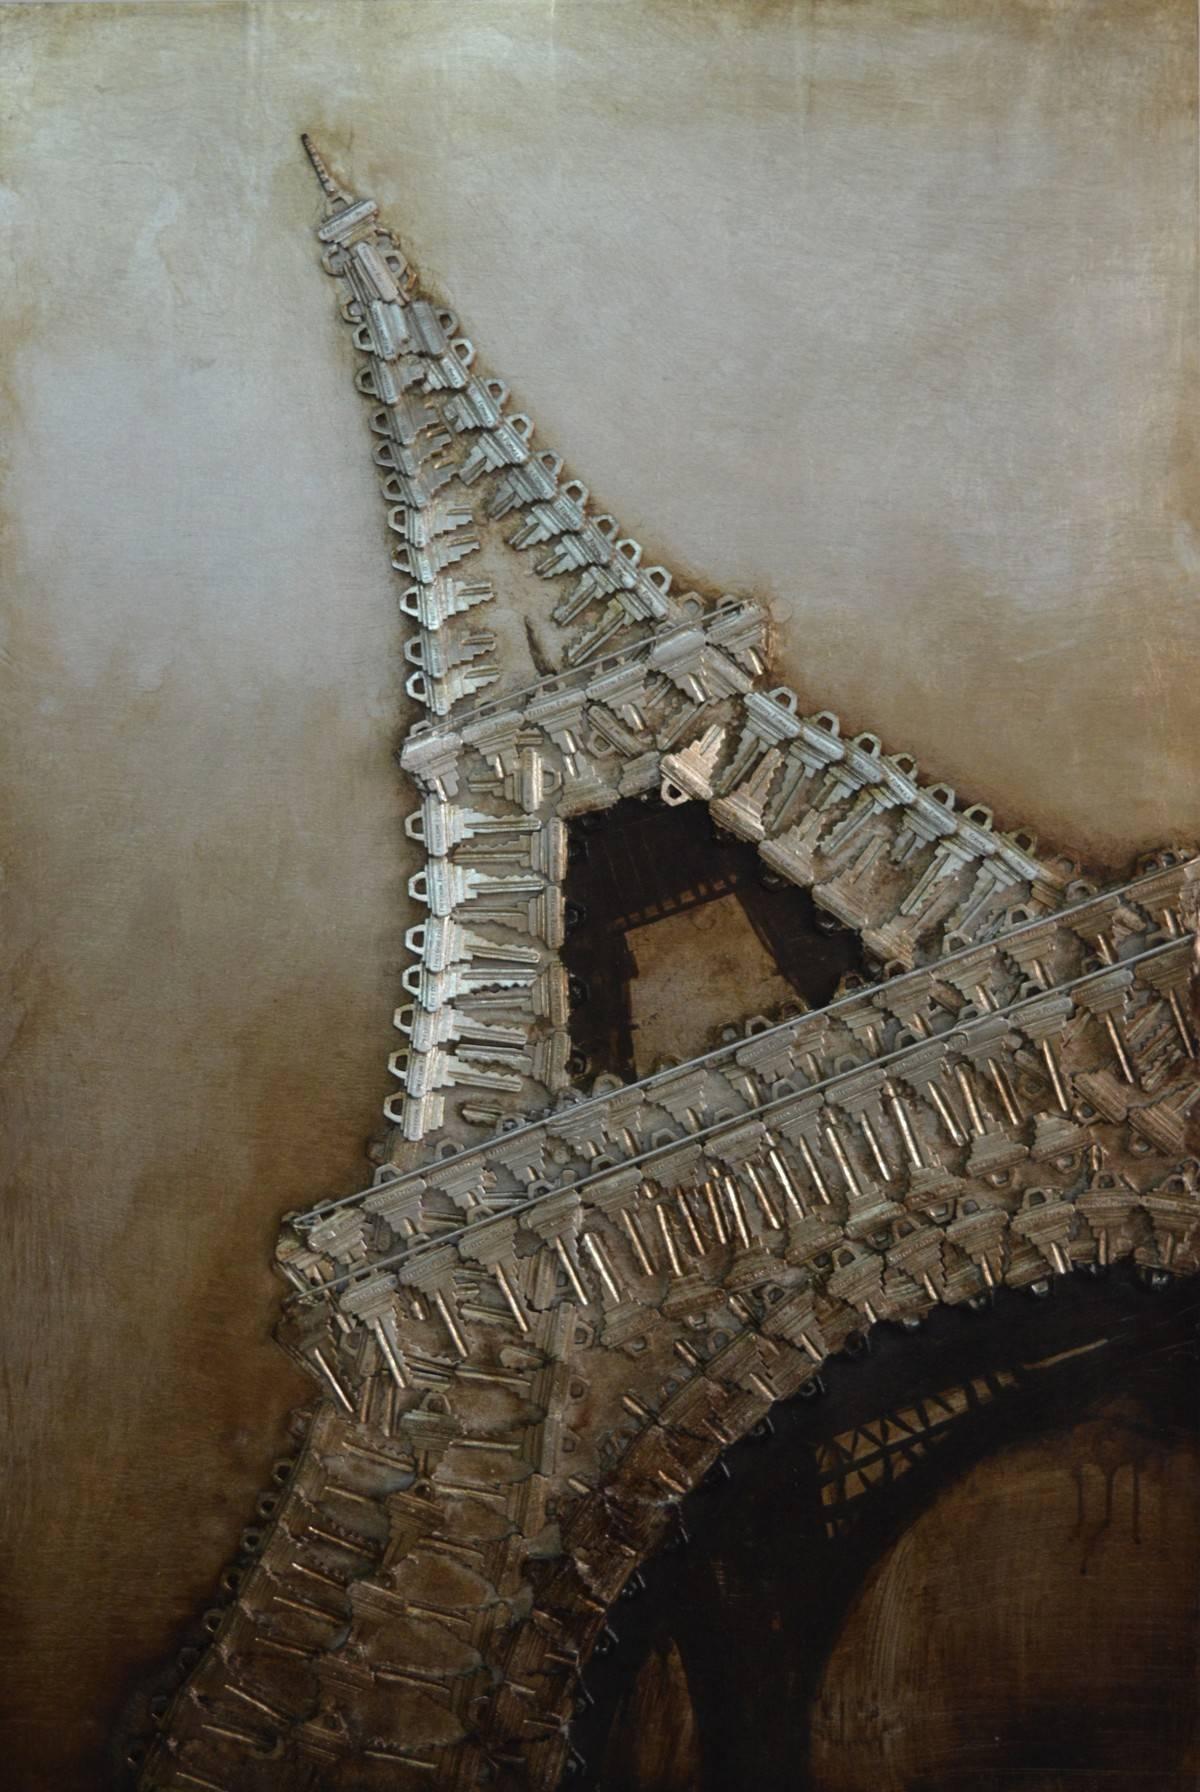 Eiffel Tower 3D Metal Wall Art – Blackbrook Interiors With Best And Newest Metal Eiffel Tower Wall Art (View 20 of 30)